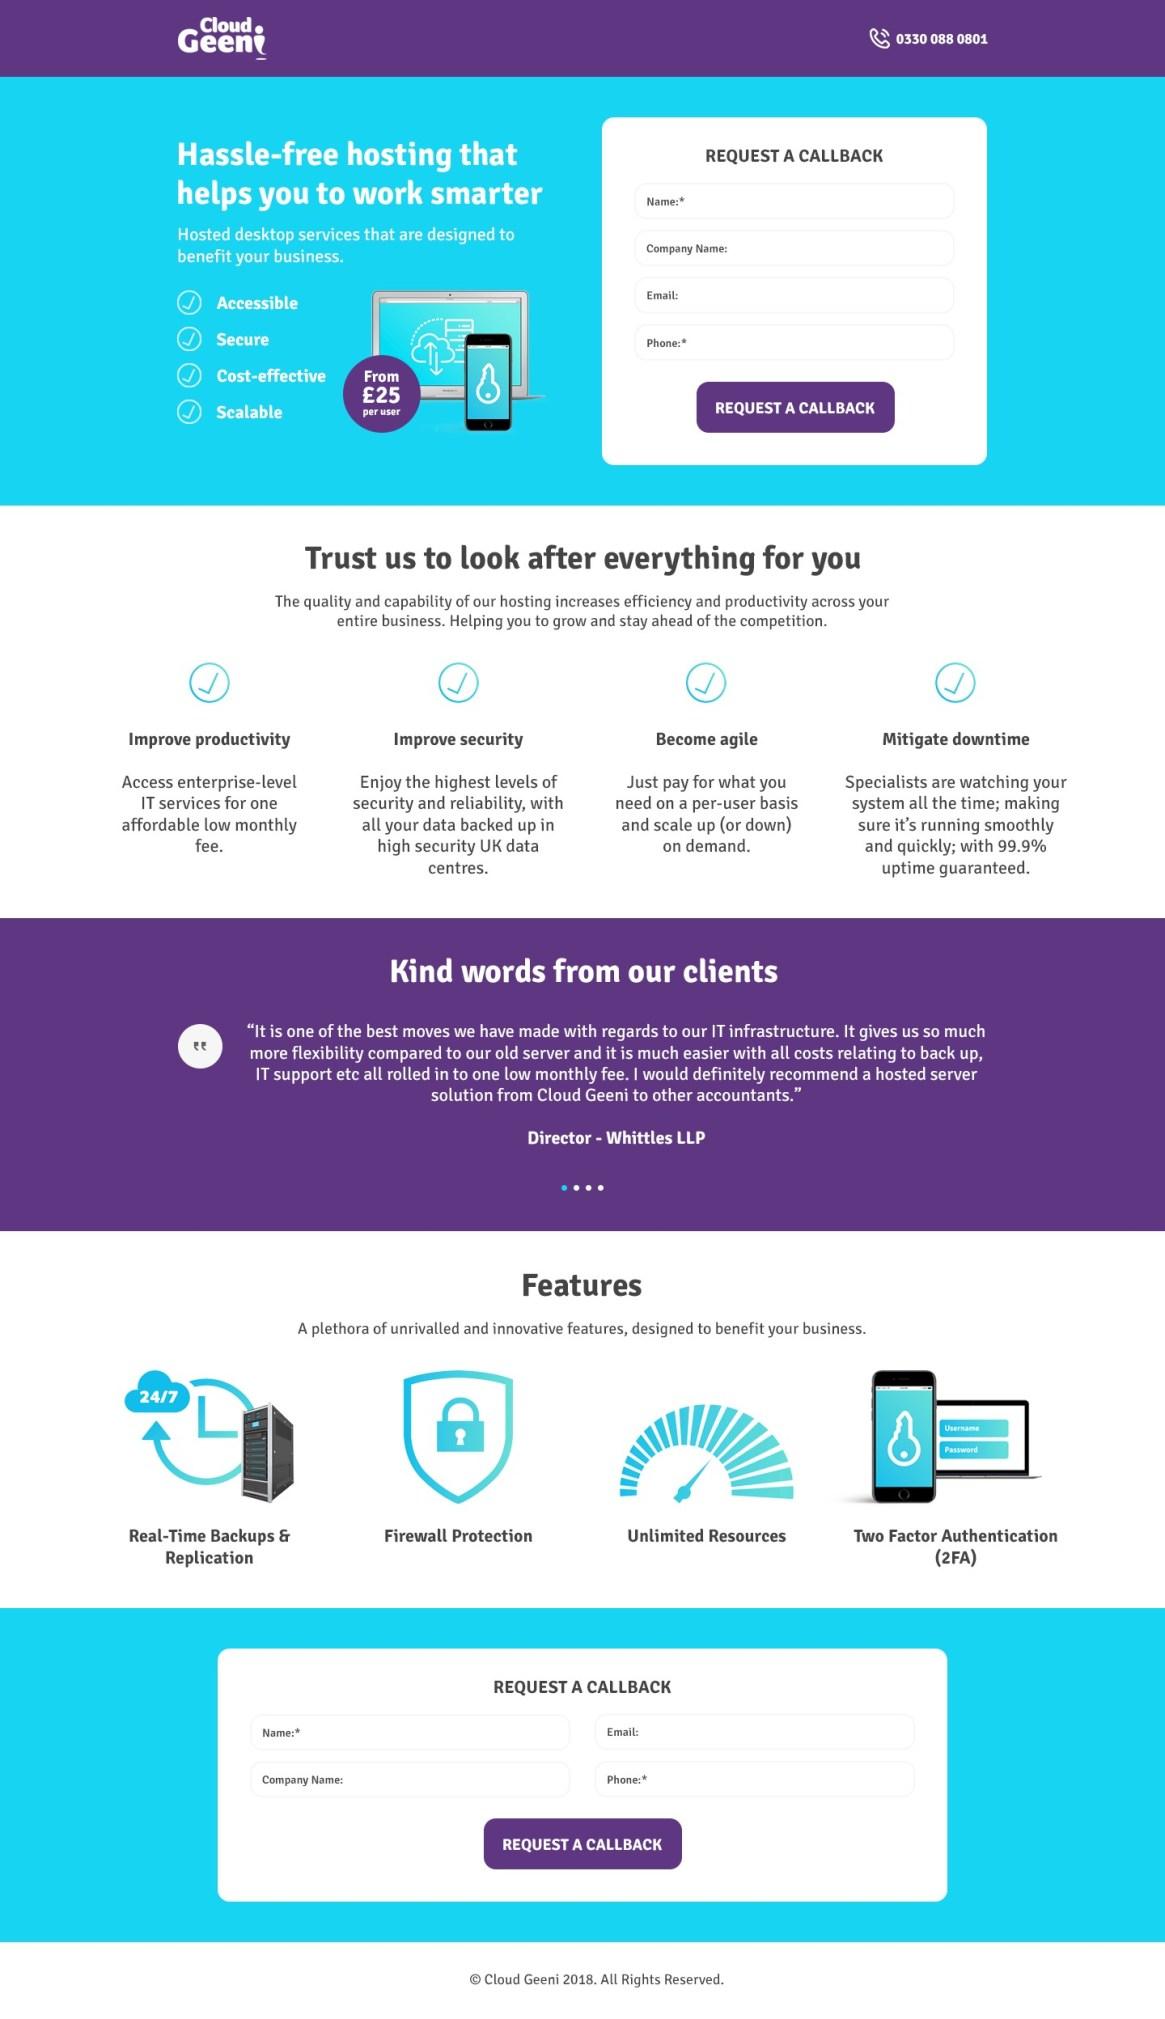 Cloud Geeni - Responsive Landing Page Design